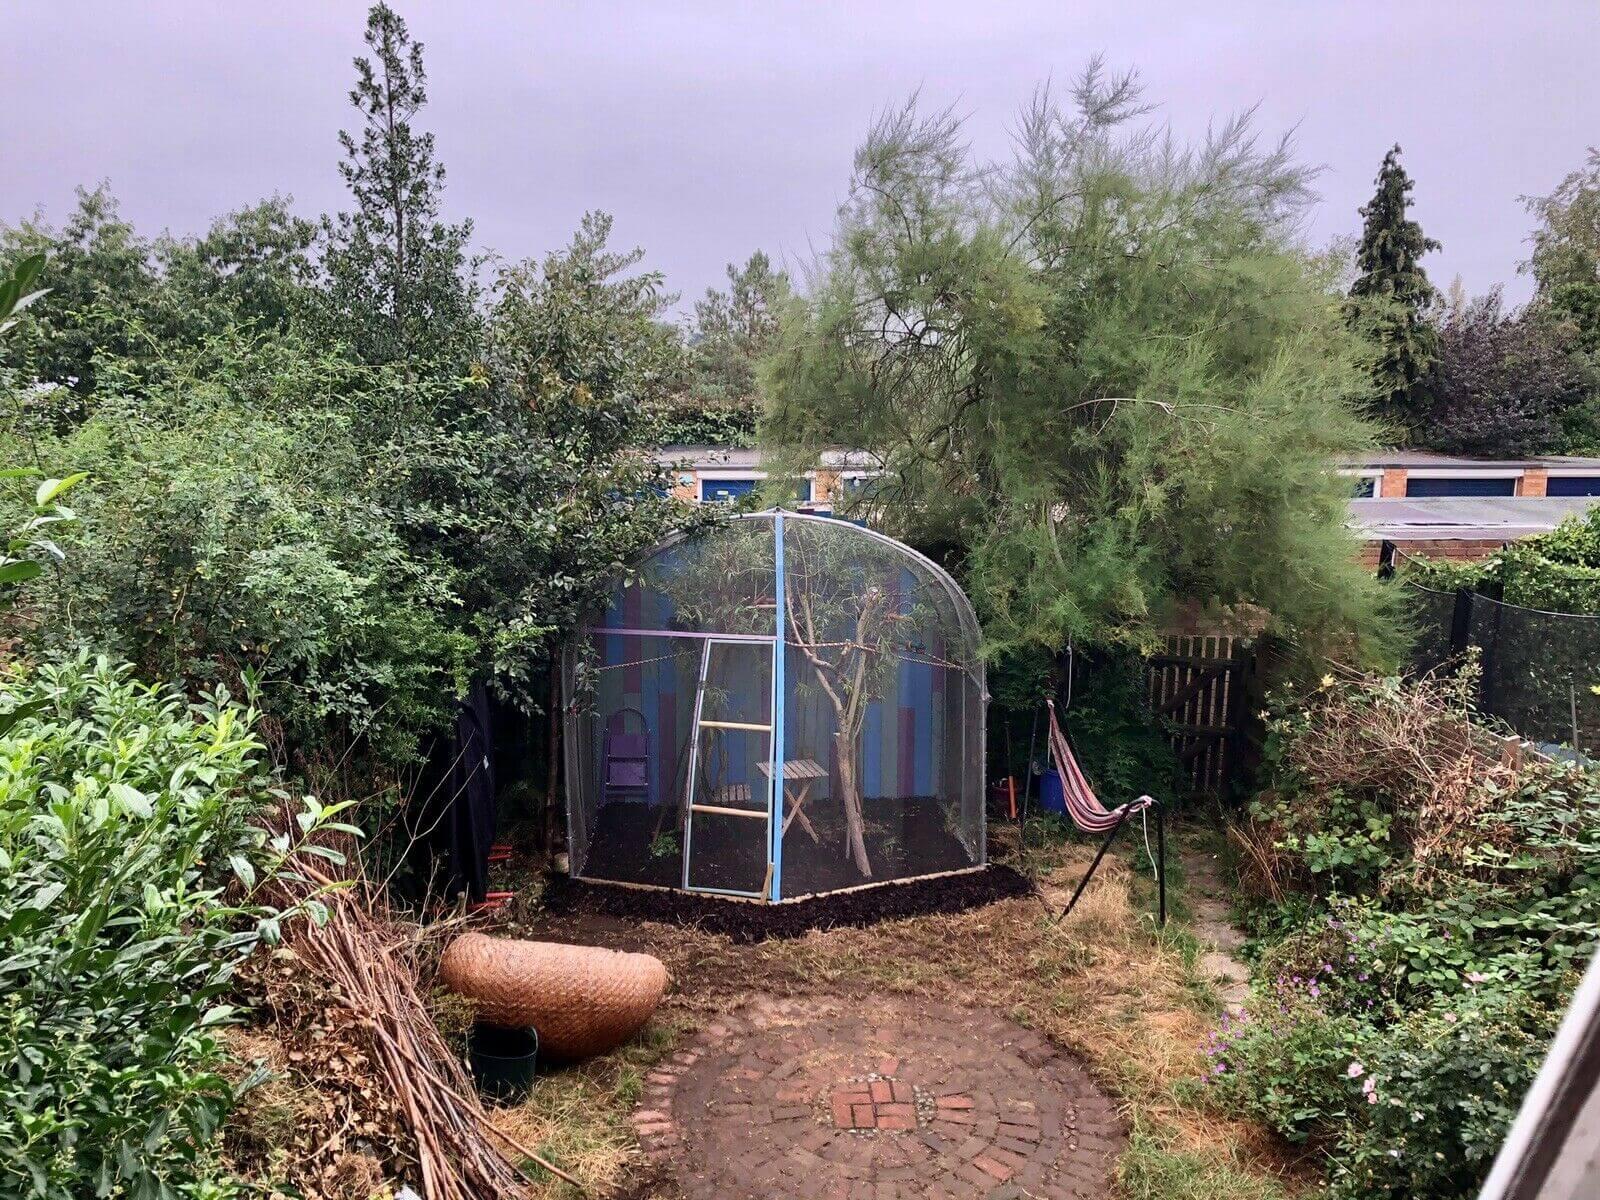 Small bird aviary enclosure in back garden